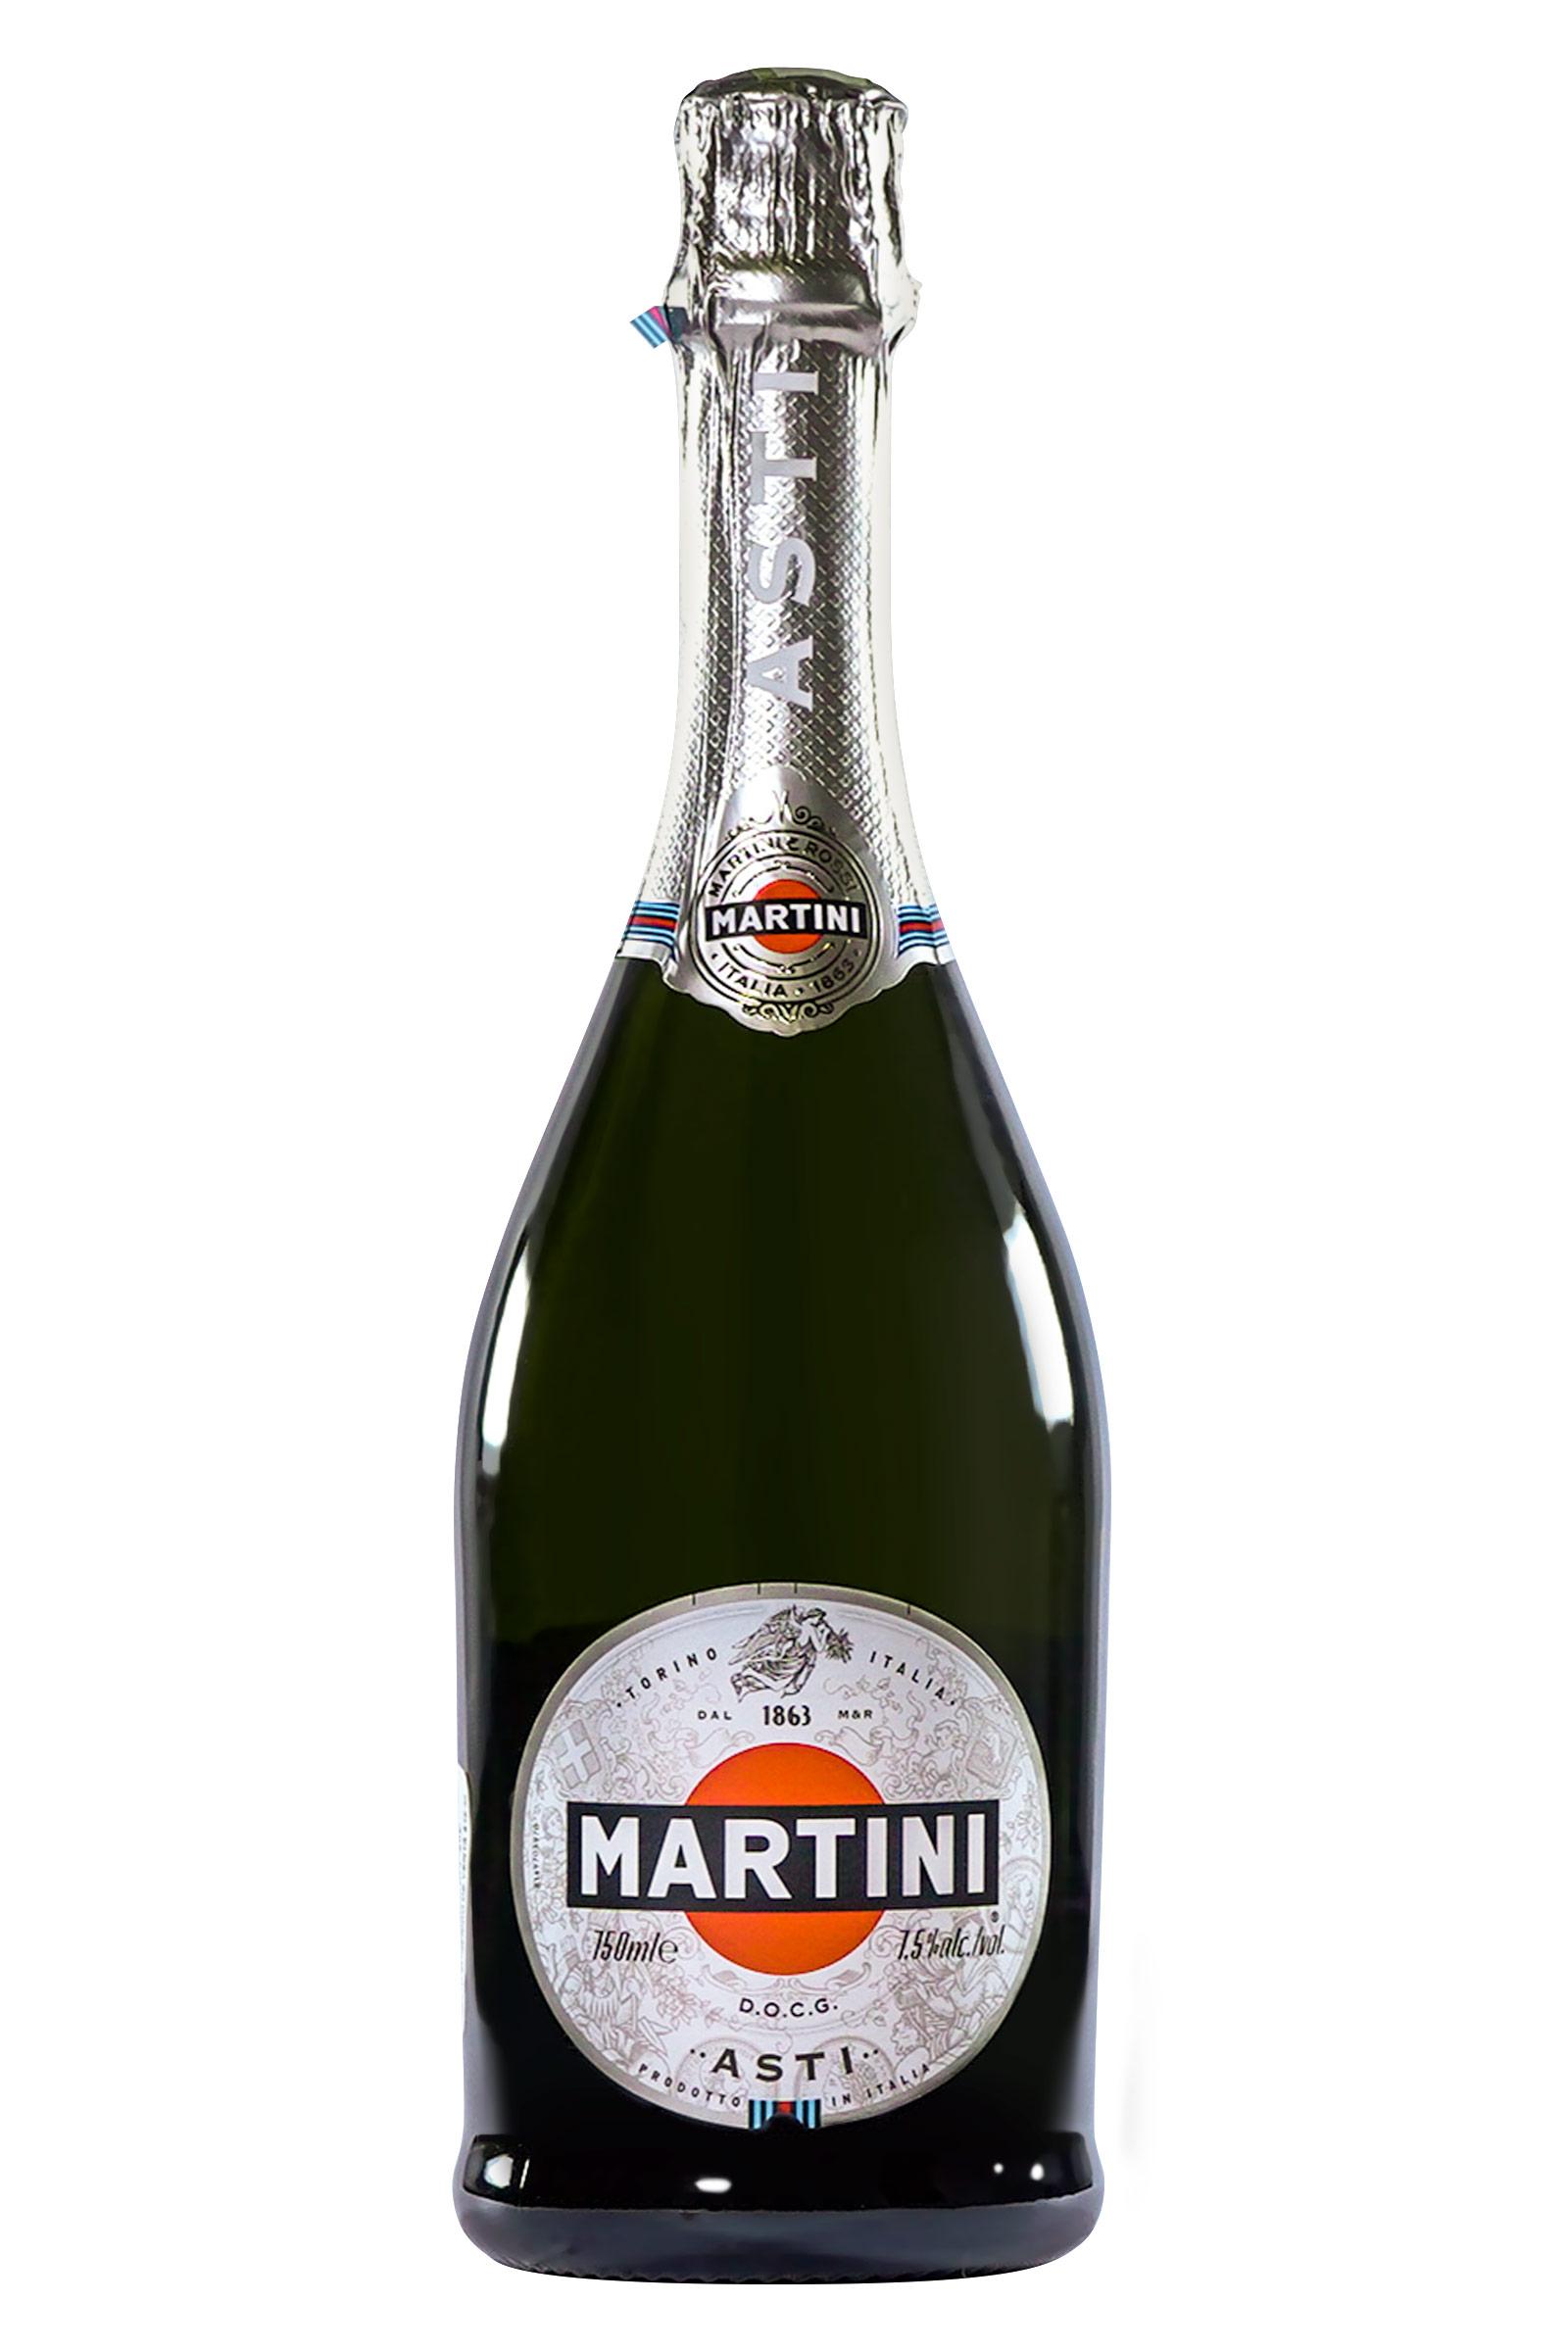 Martini Asti 750ml